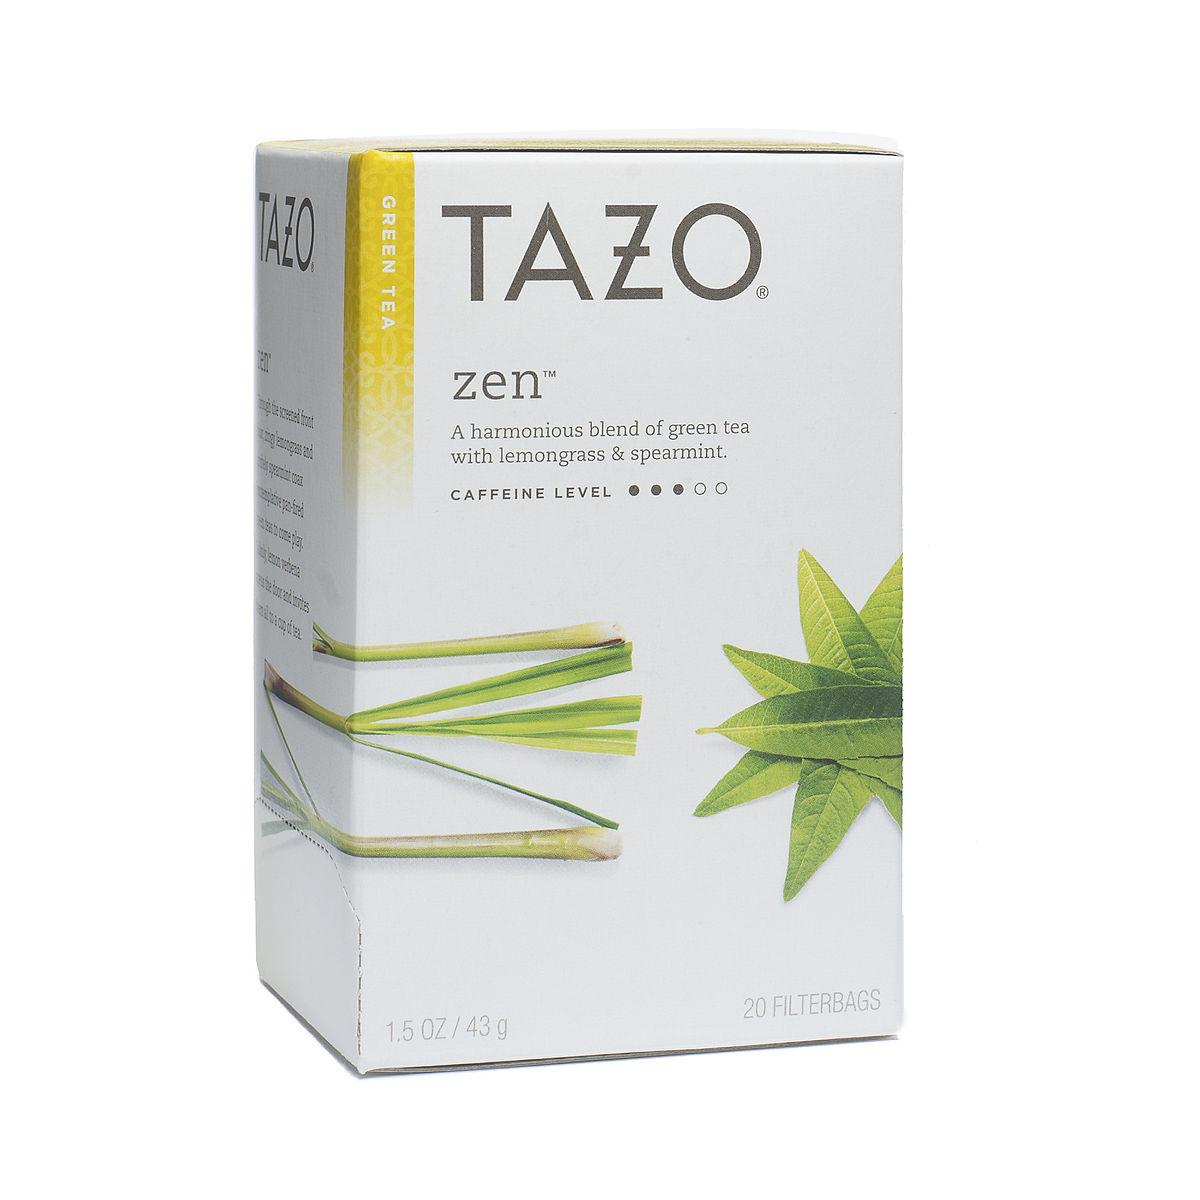 Tazo green teas